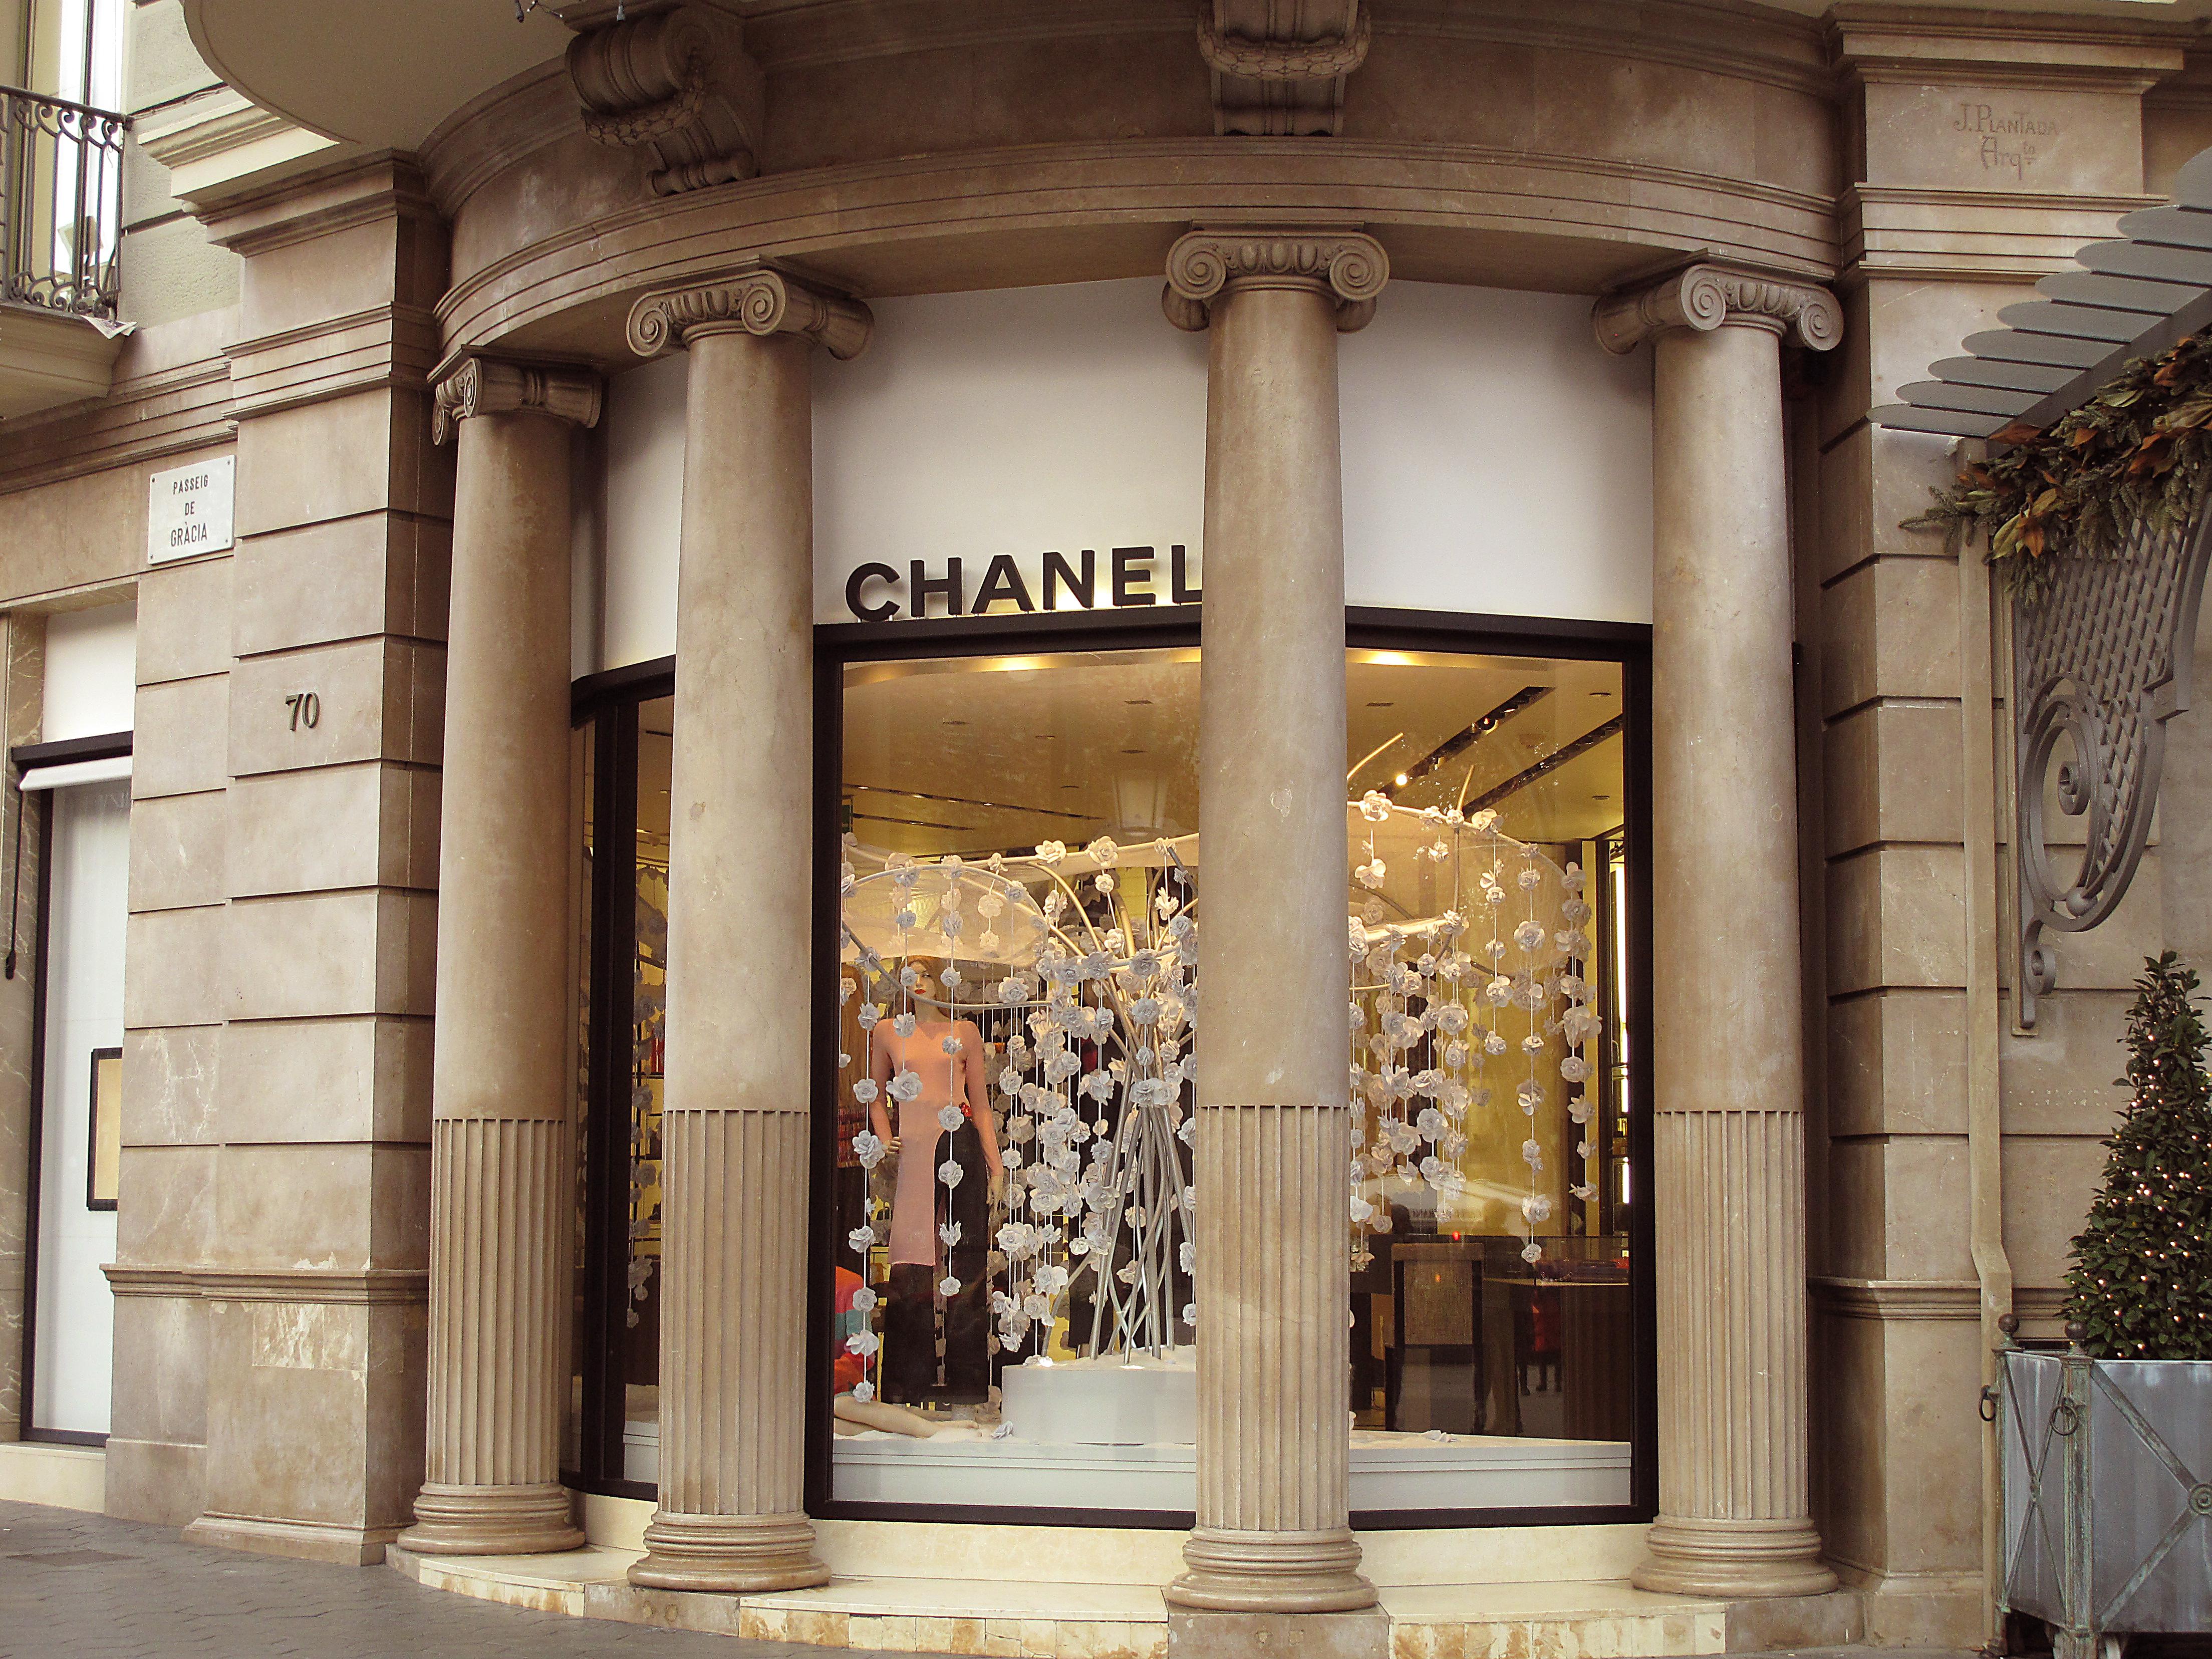 2db735161 File:070 Chanel, pg. de Gràcia 70 (Barcelona), cantonada c. València.jpg